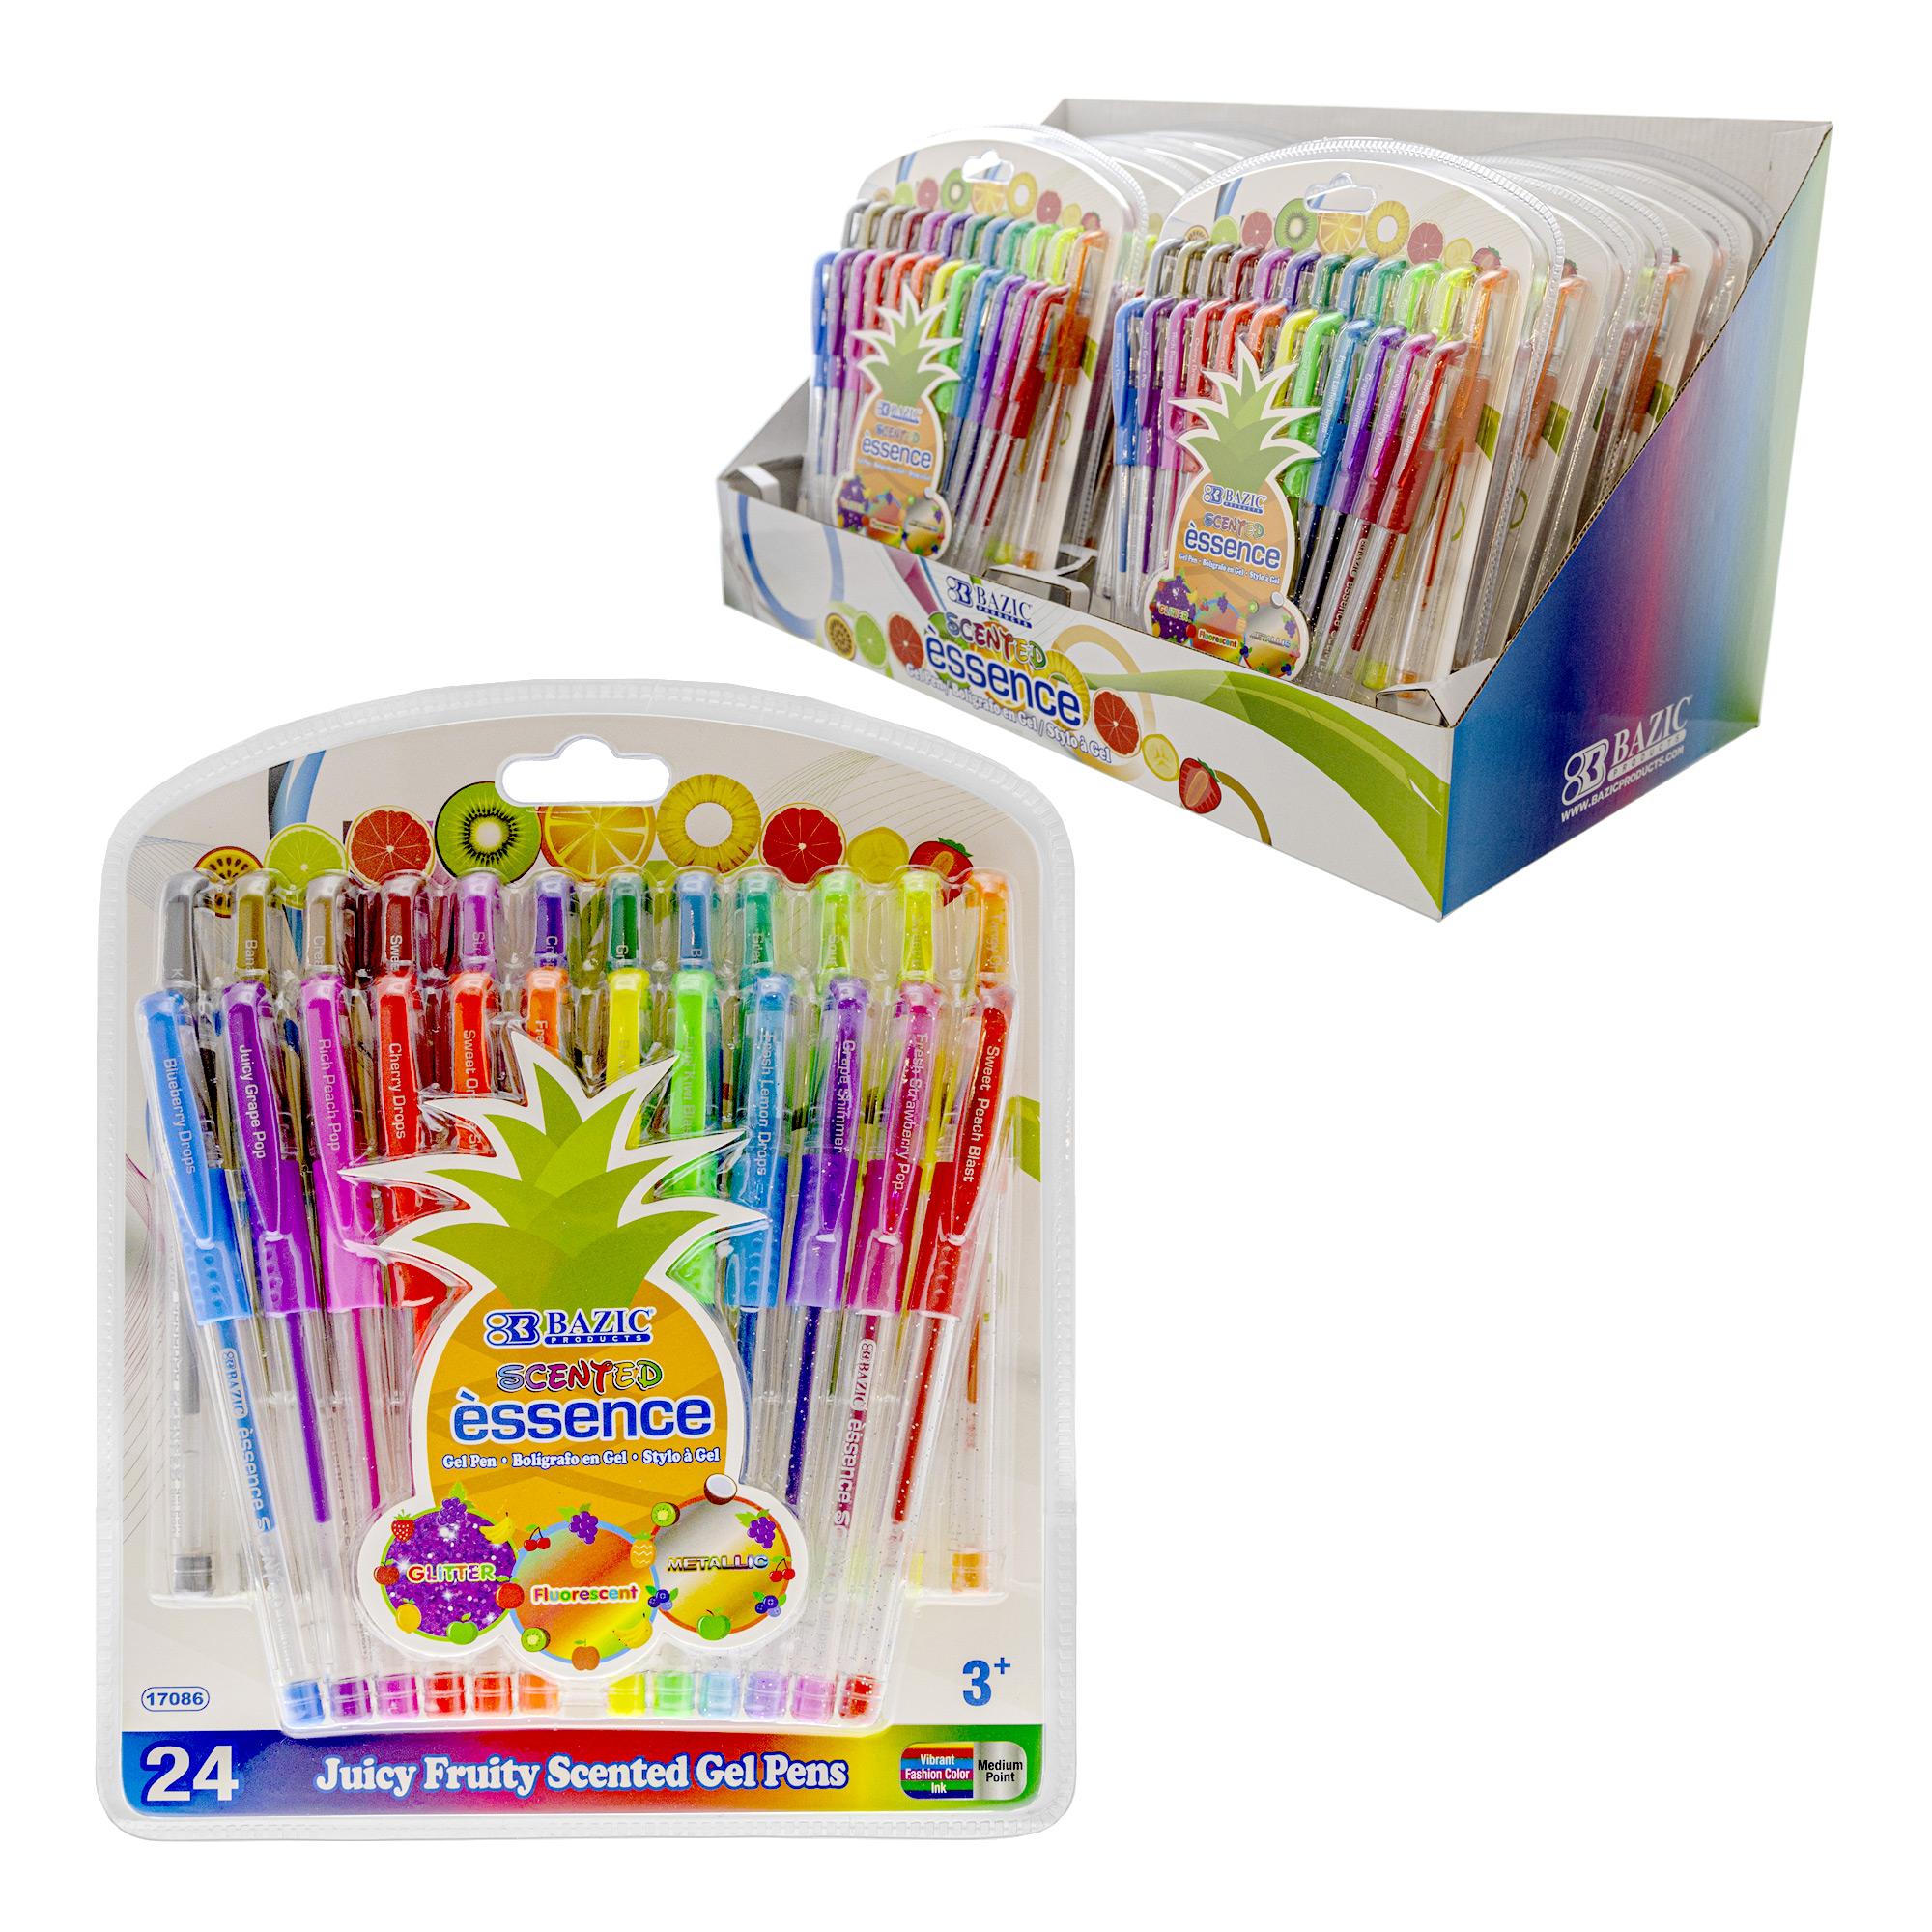 Essence Gel Pen 24 Scented Glitter Neon Metalllic Color w/ Cushion Grip